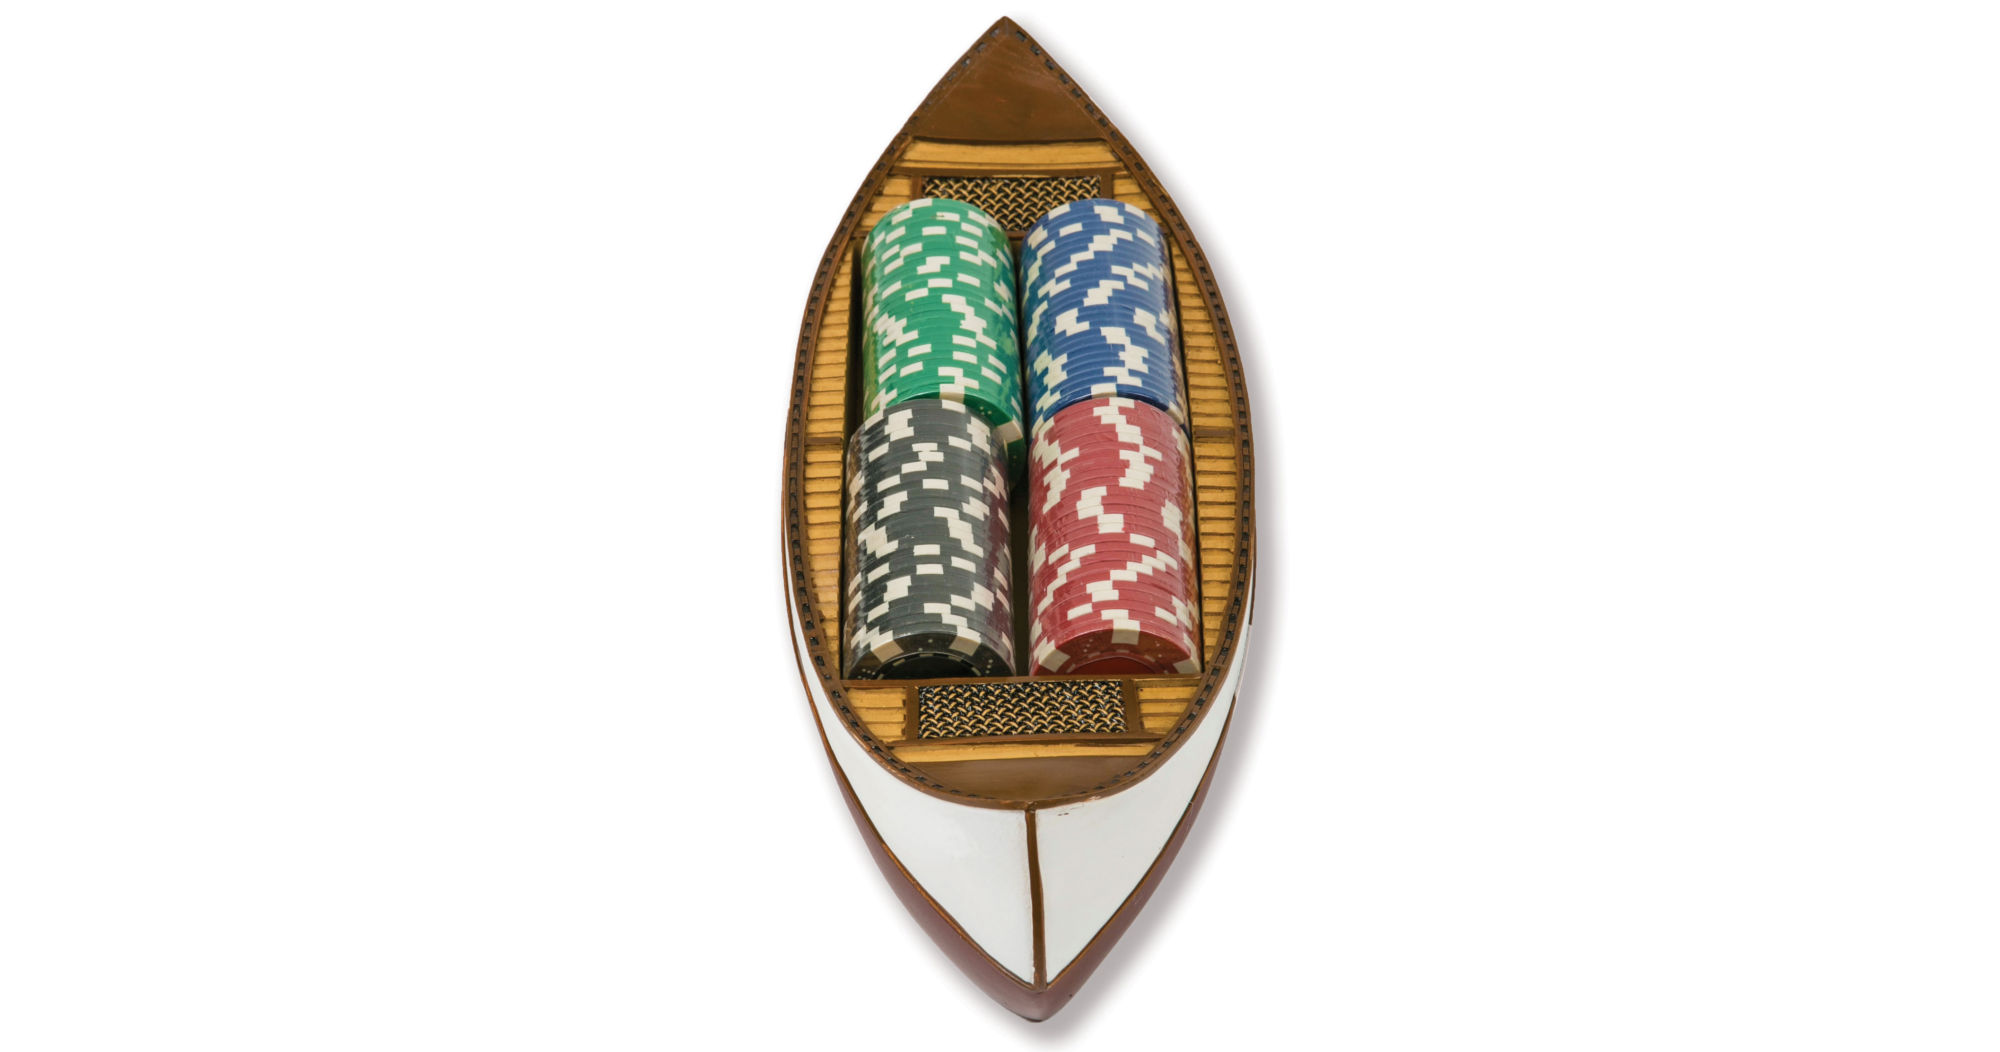 Northern michigan casinos sin city online casino